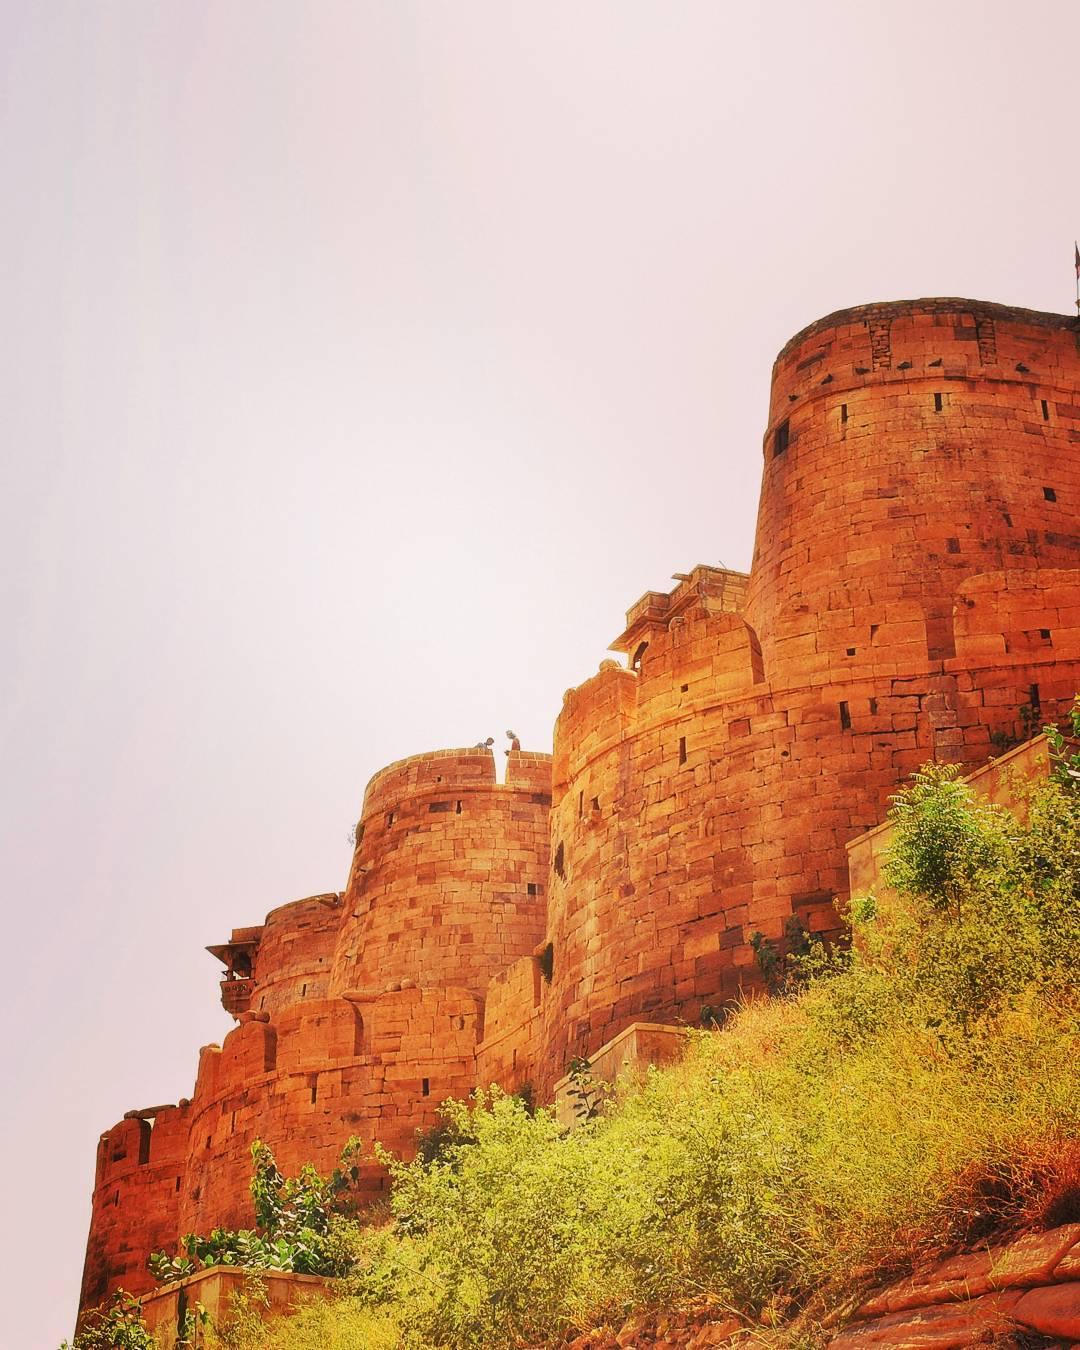 Sonar Killa, Jaisalmer